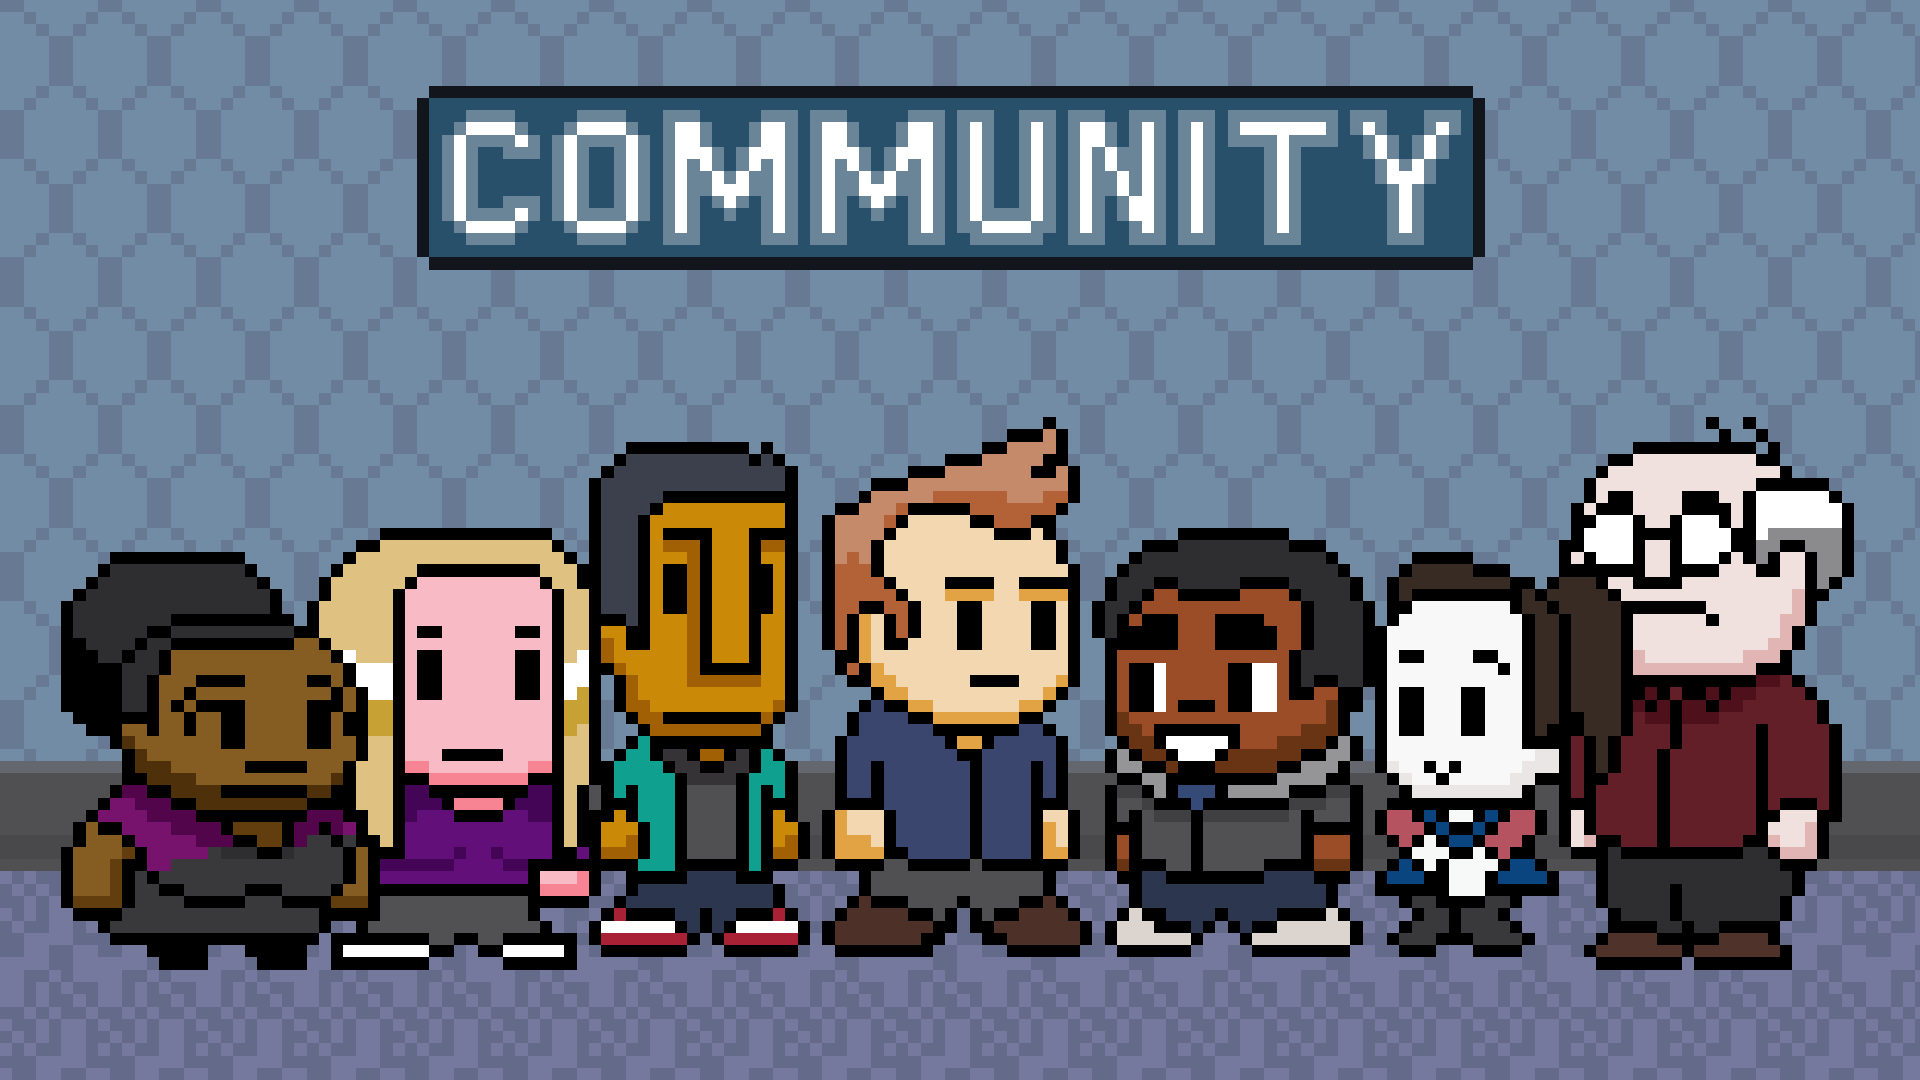 Community 8-bit wallpaper by zequihumano.deviantart.com on  deviantART 3701df07a689